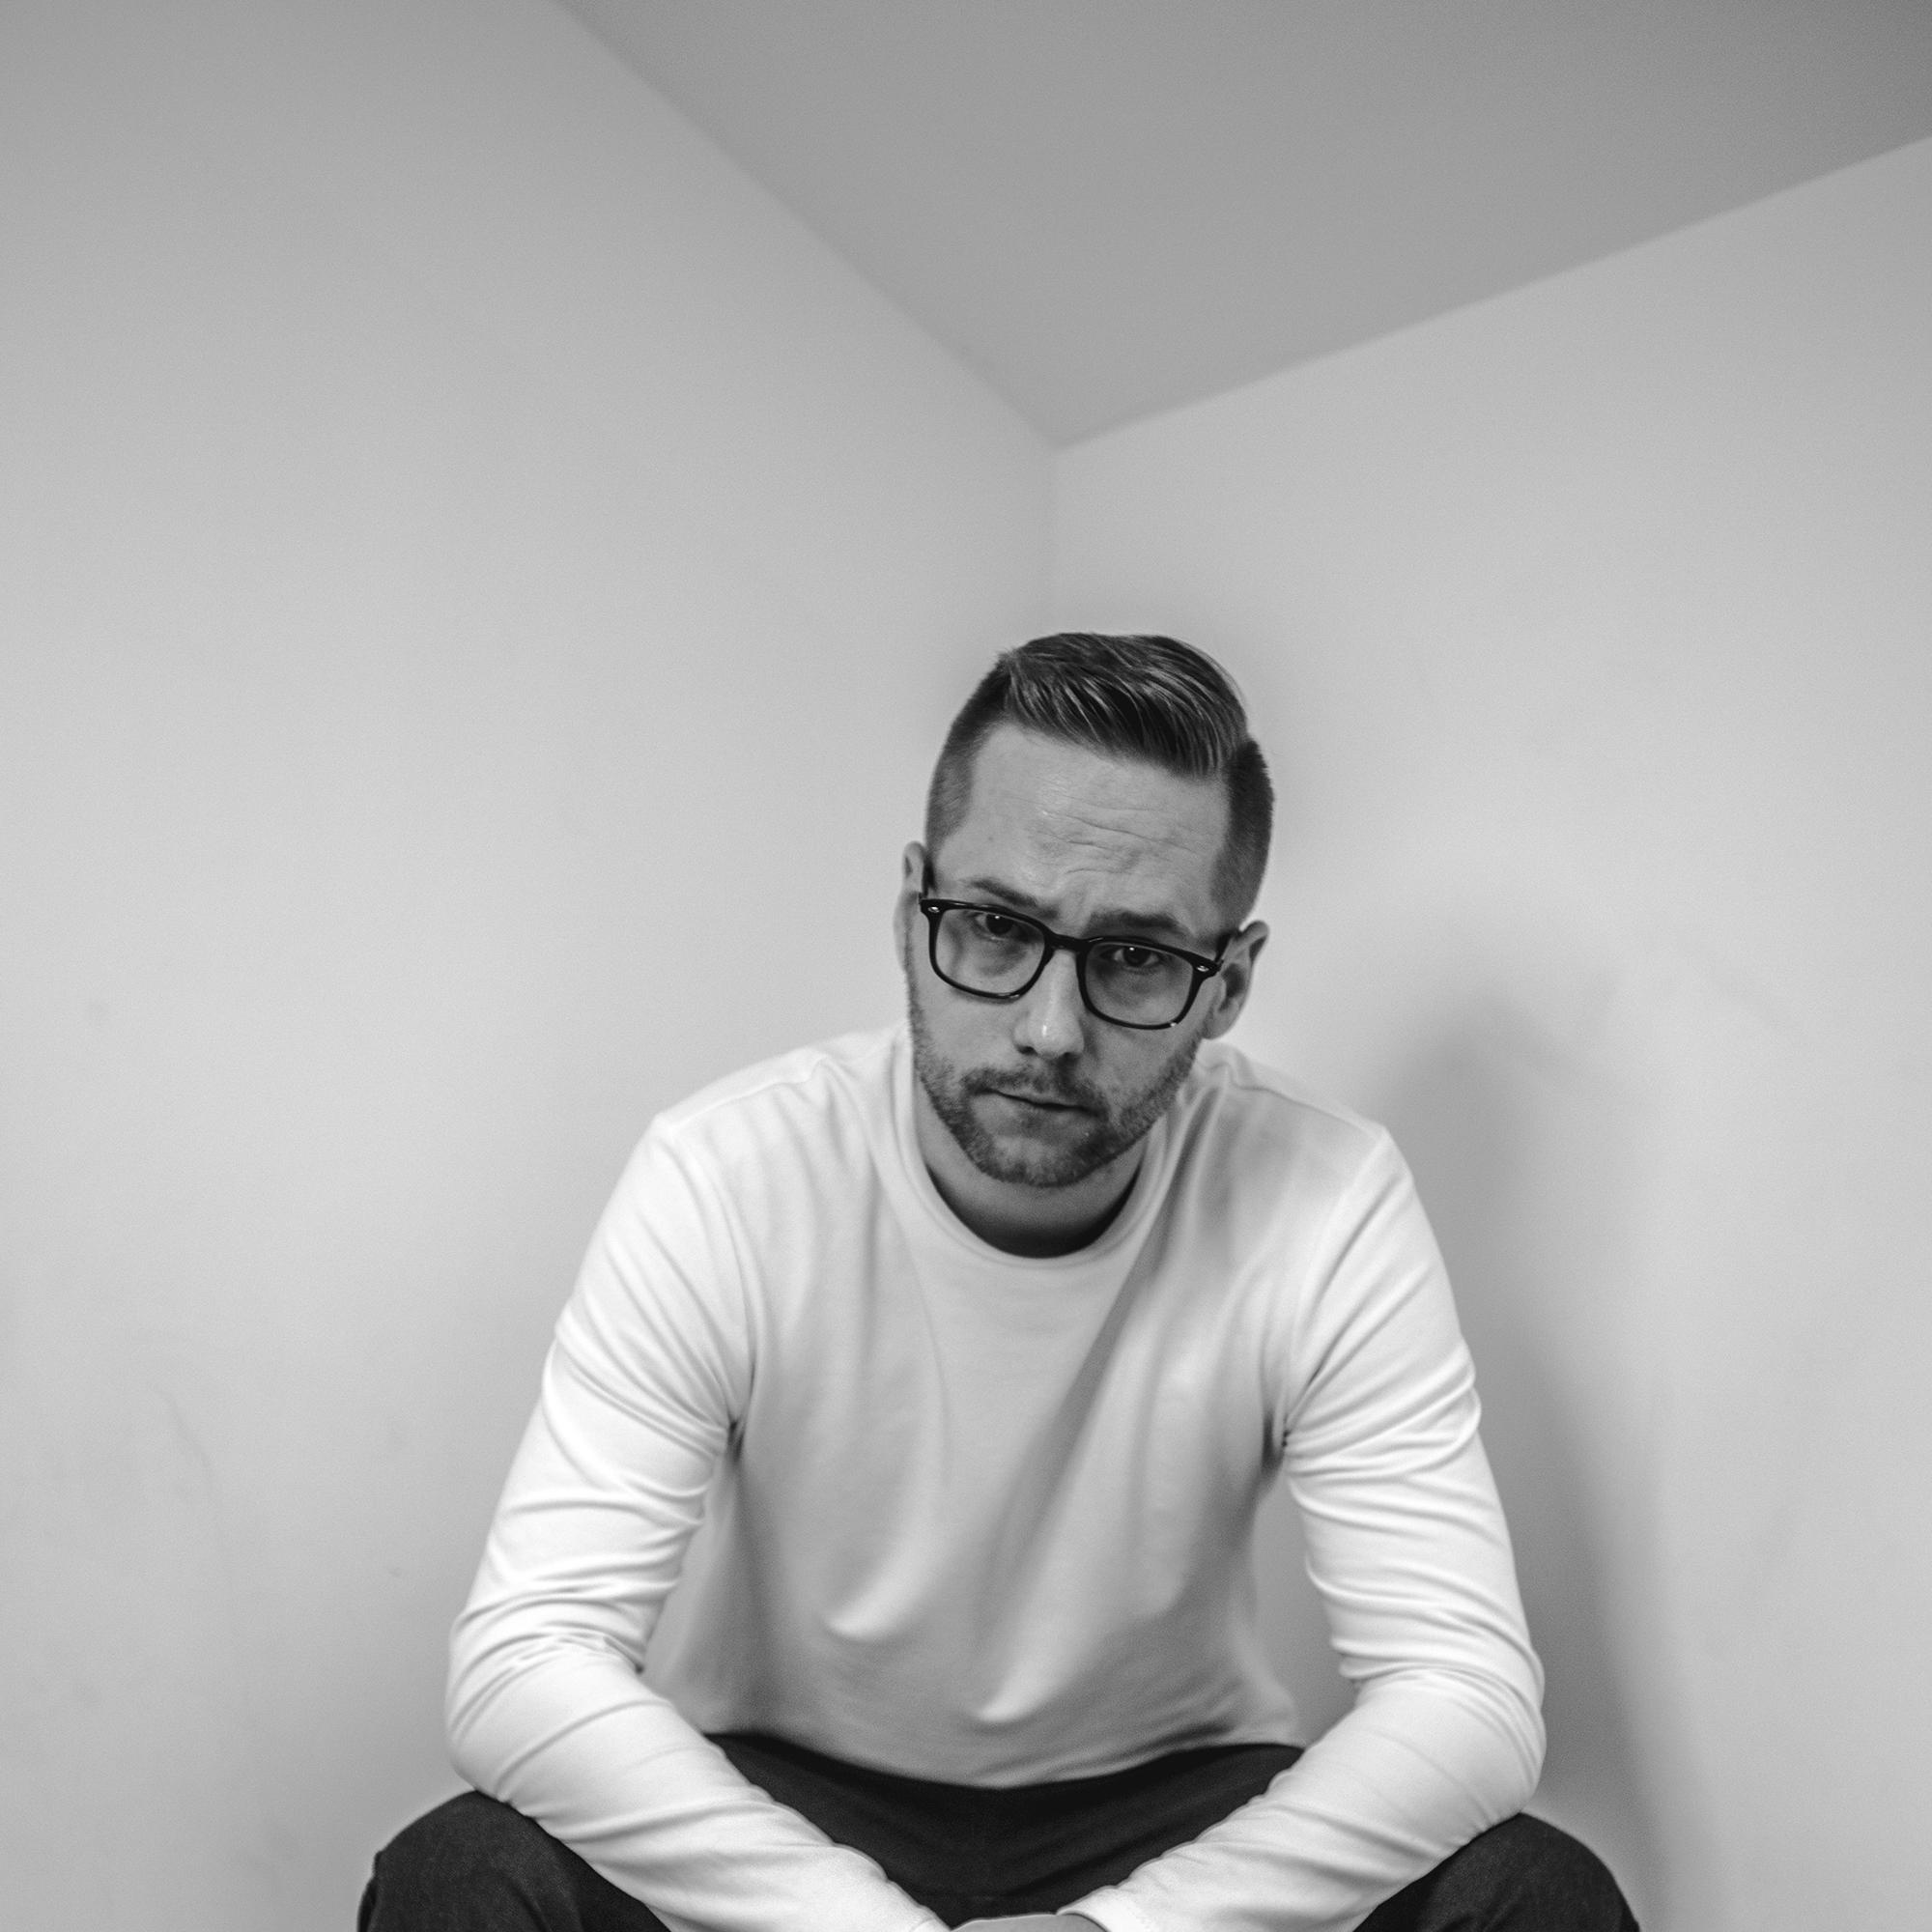 Filip Abramczyk (Pysh)